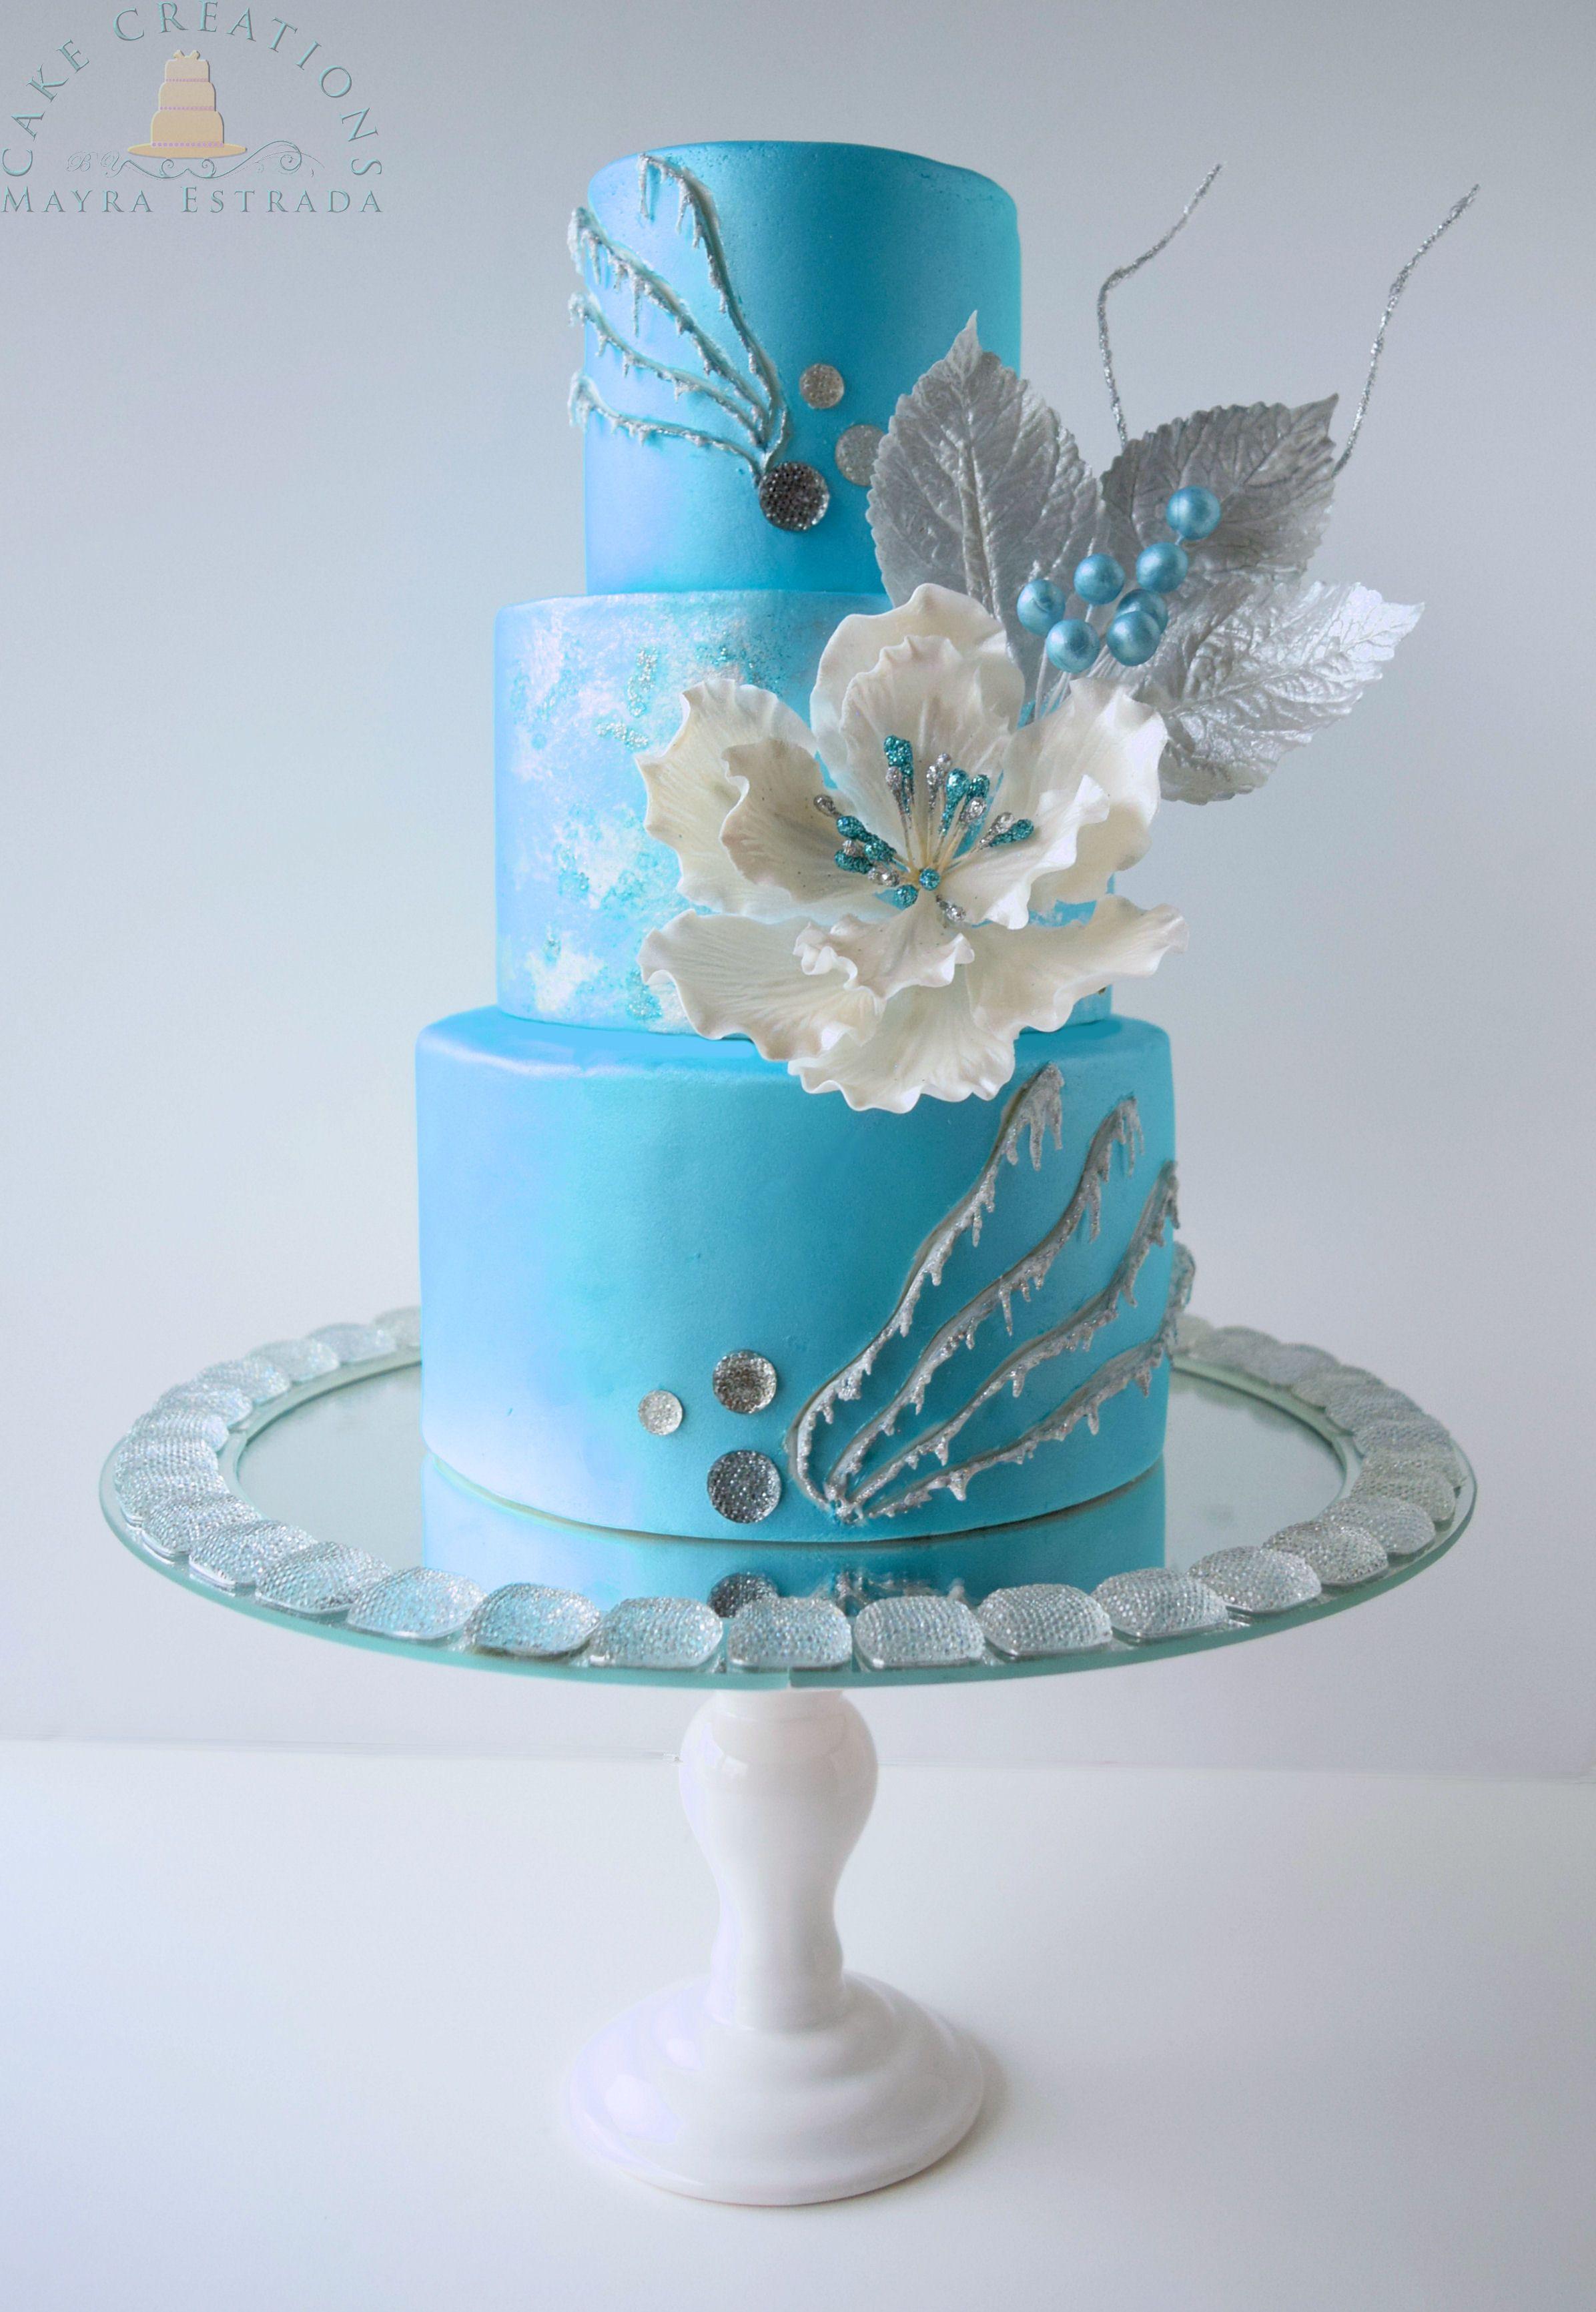 Sky Blue Wedding Cake With White Flowers